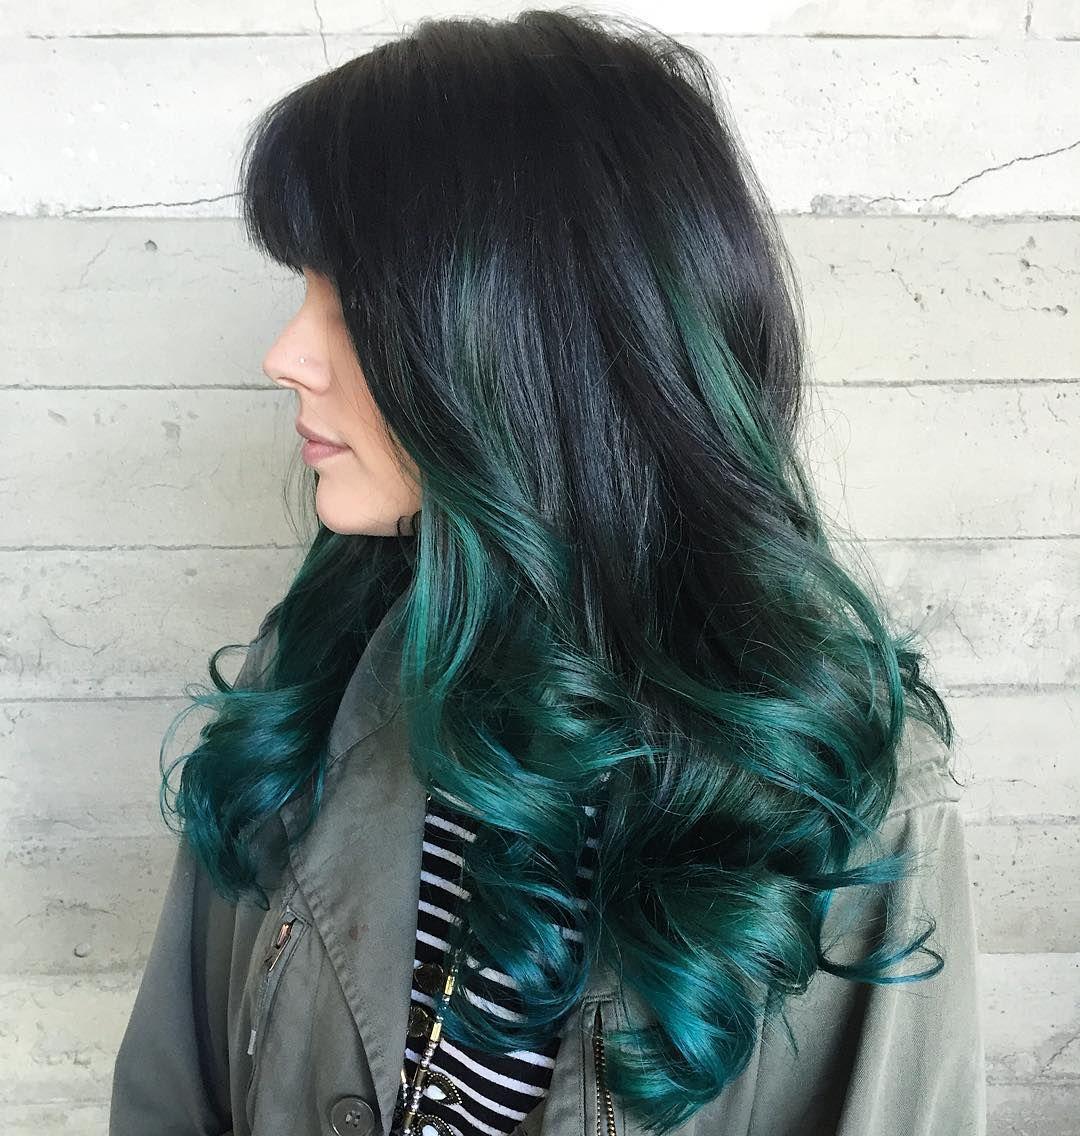 Black Hair With Blue And Teal Highlights Hair Highlights Blue Hair Highlights Brunette Hair Color